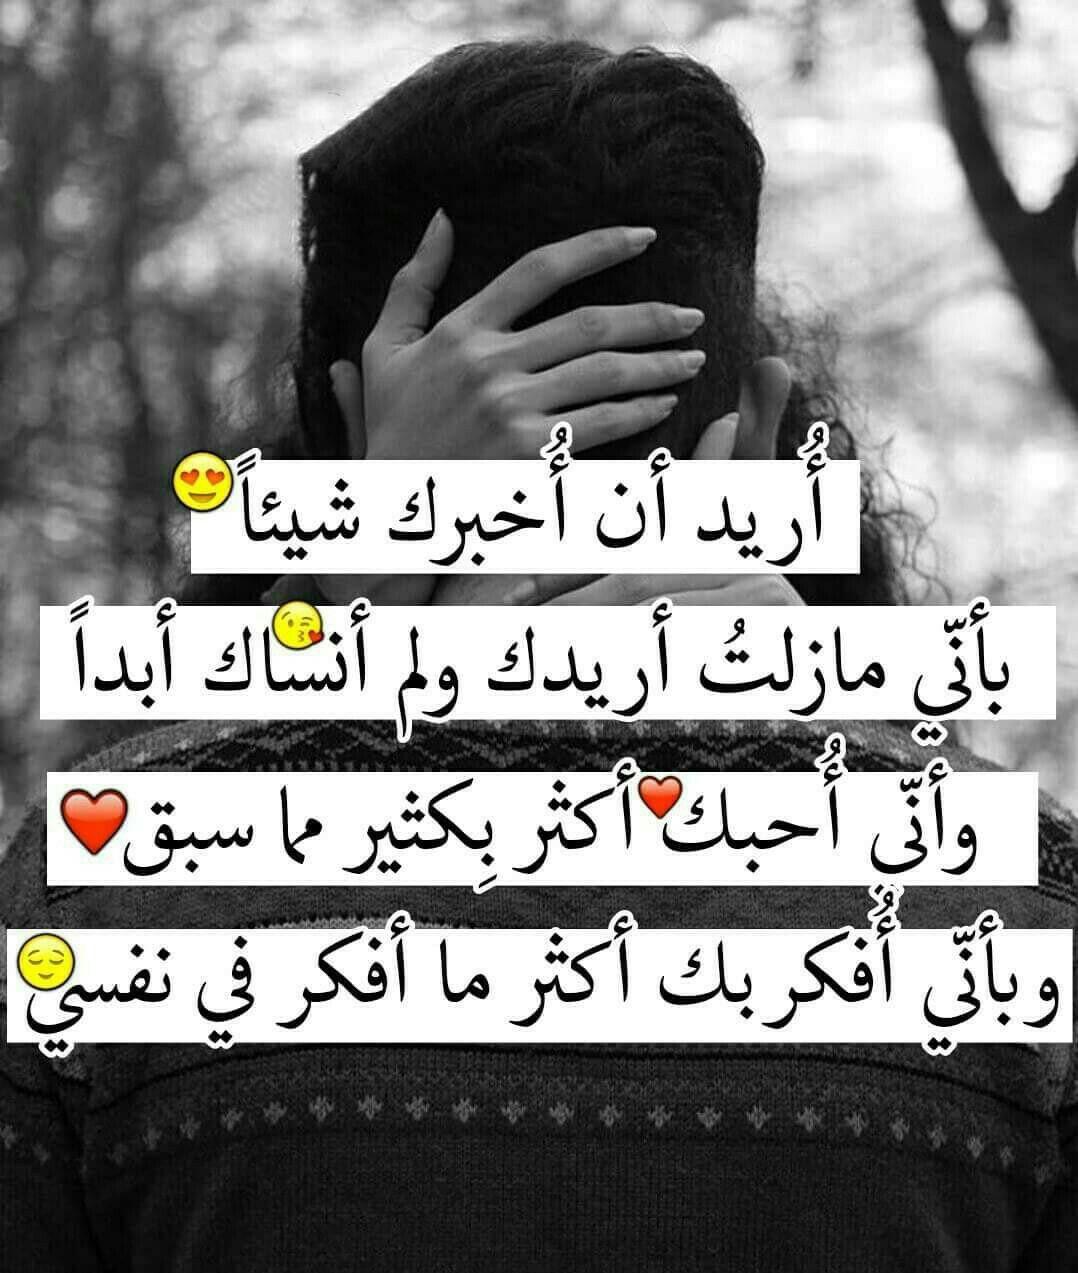 Картинки на арабском я скучаю